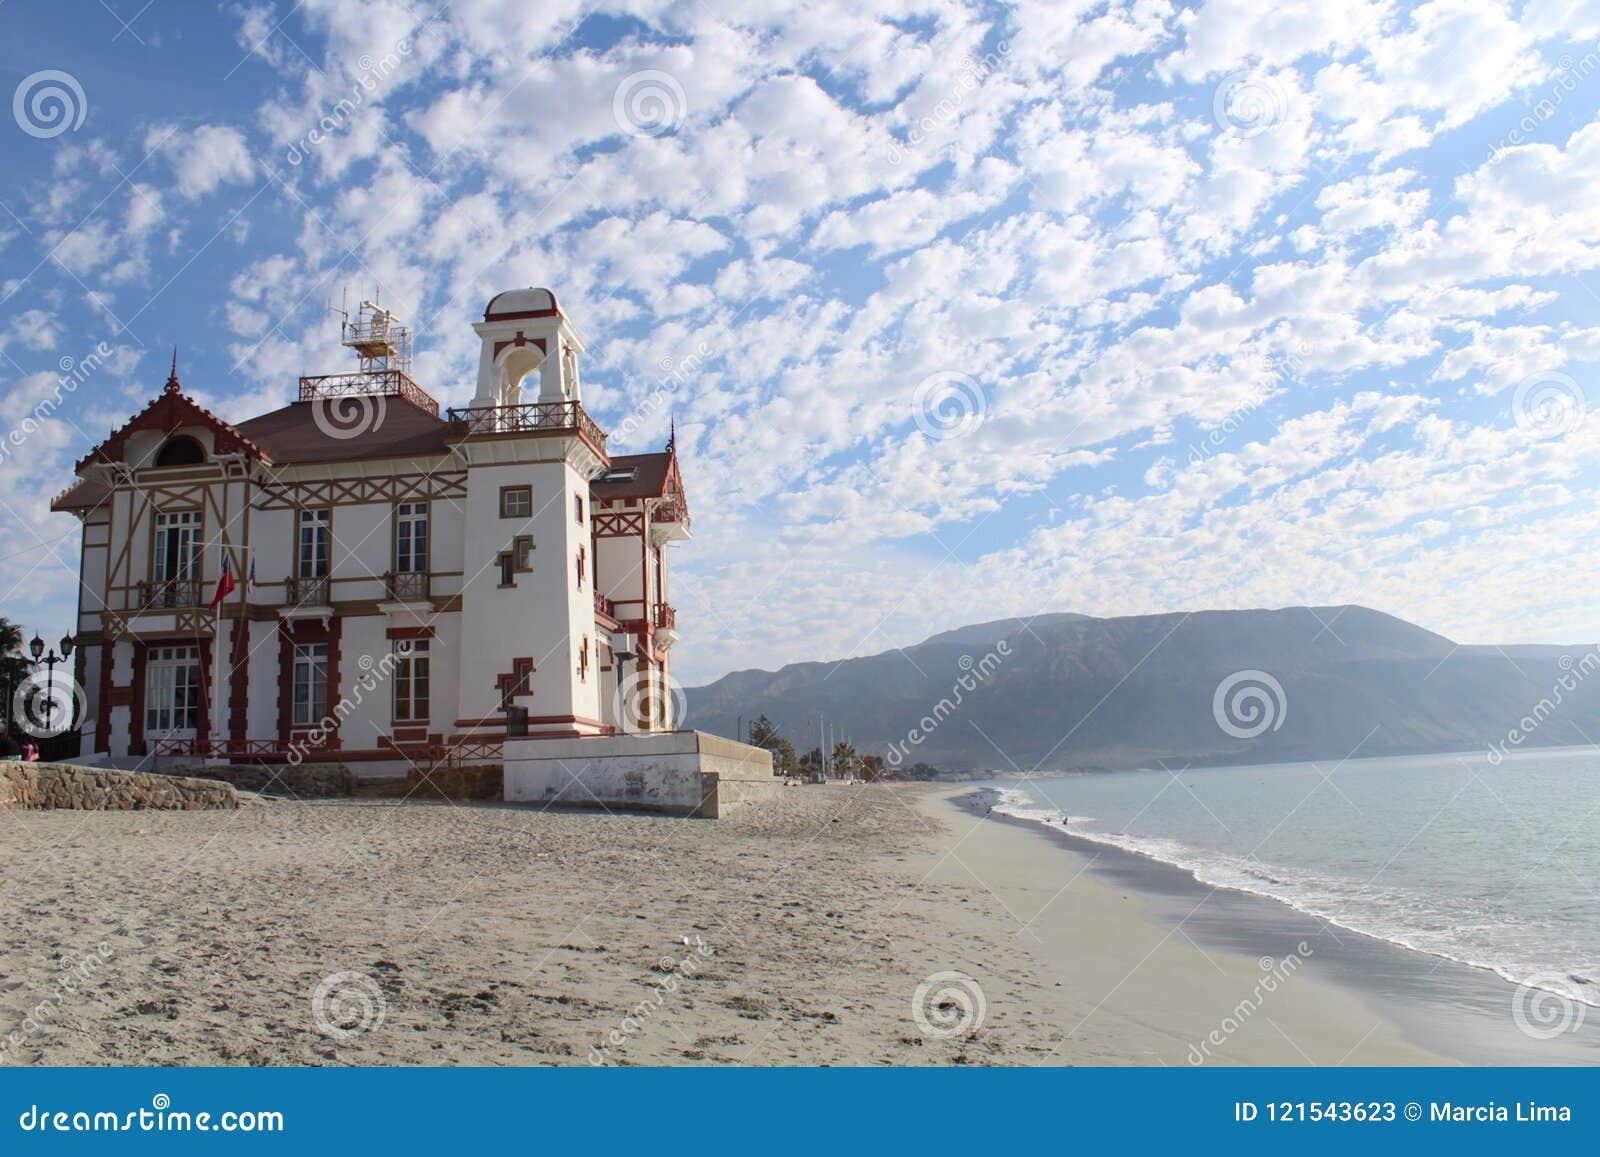 En beachfront byggnad som lokaliseras i den kust- staden av Mejillones